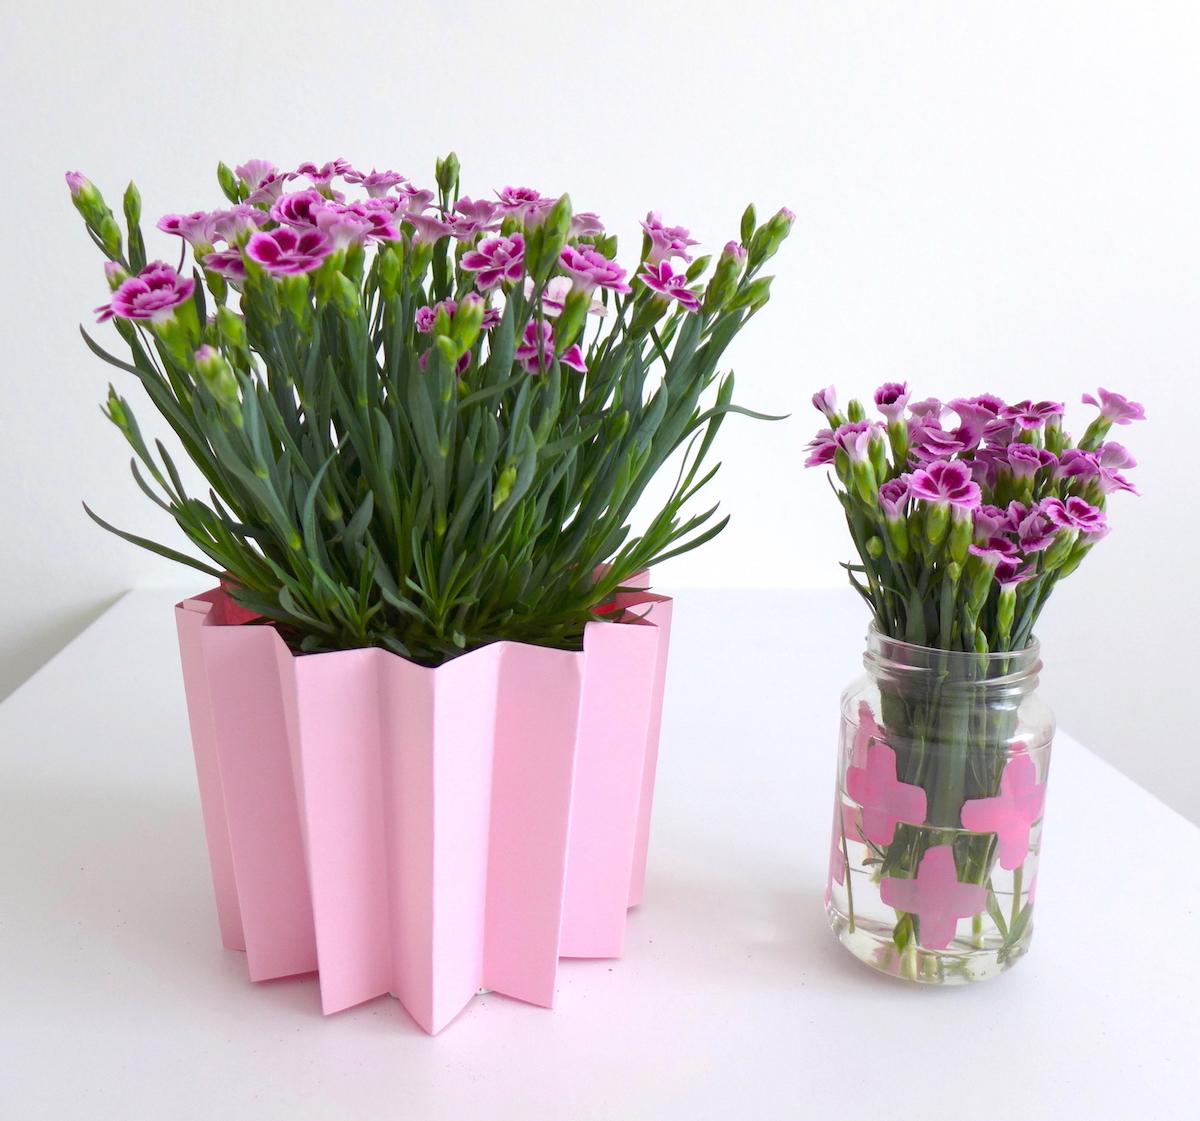 Pink Day DIY Blumen Deko Vase und Blumentopfmantel sophiagaleria